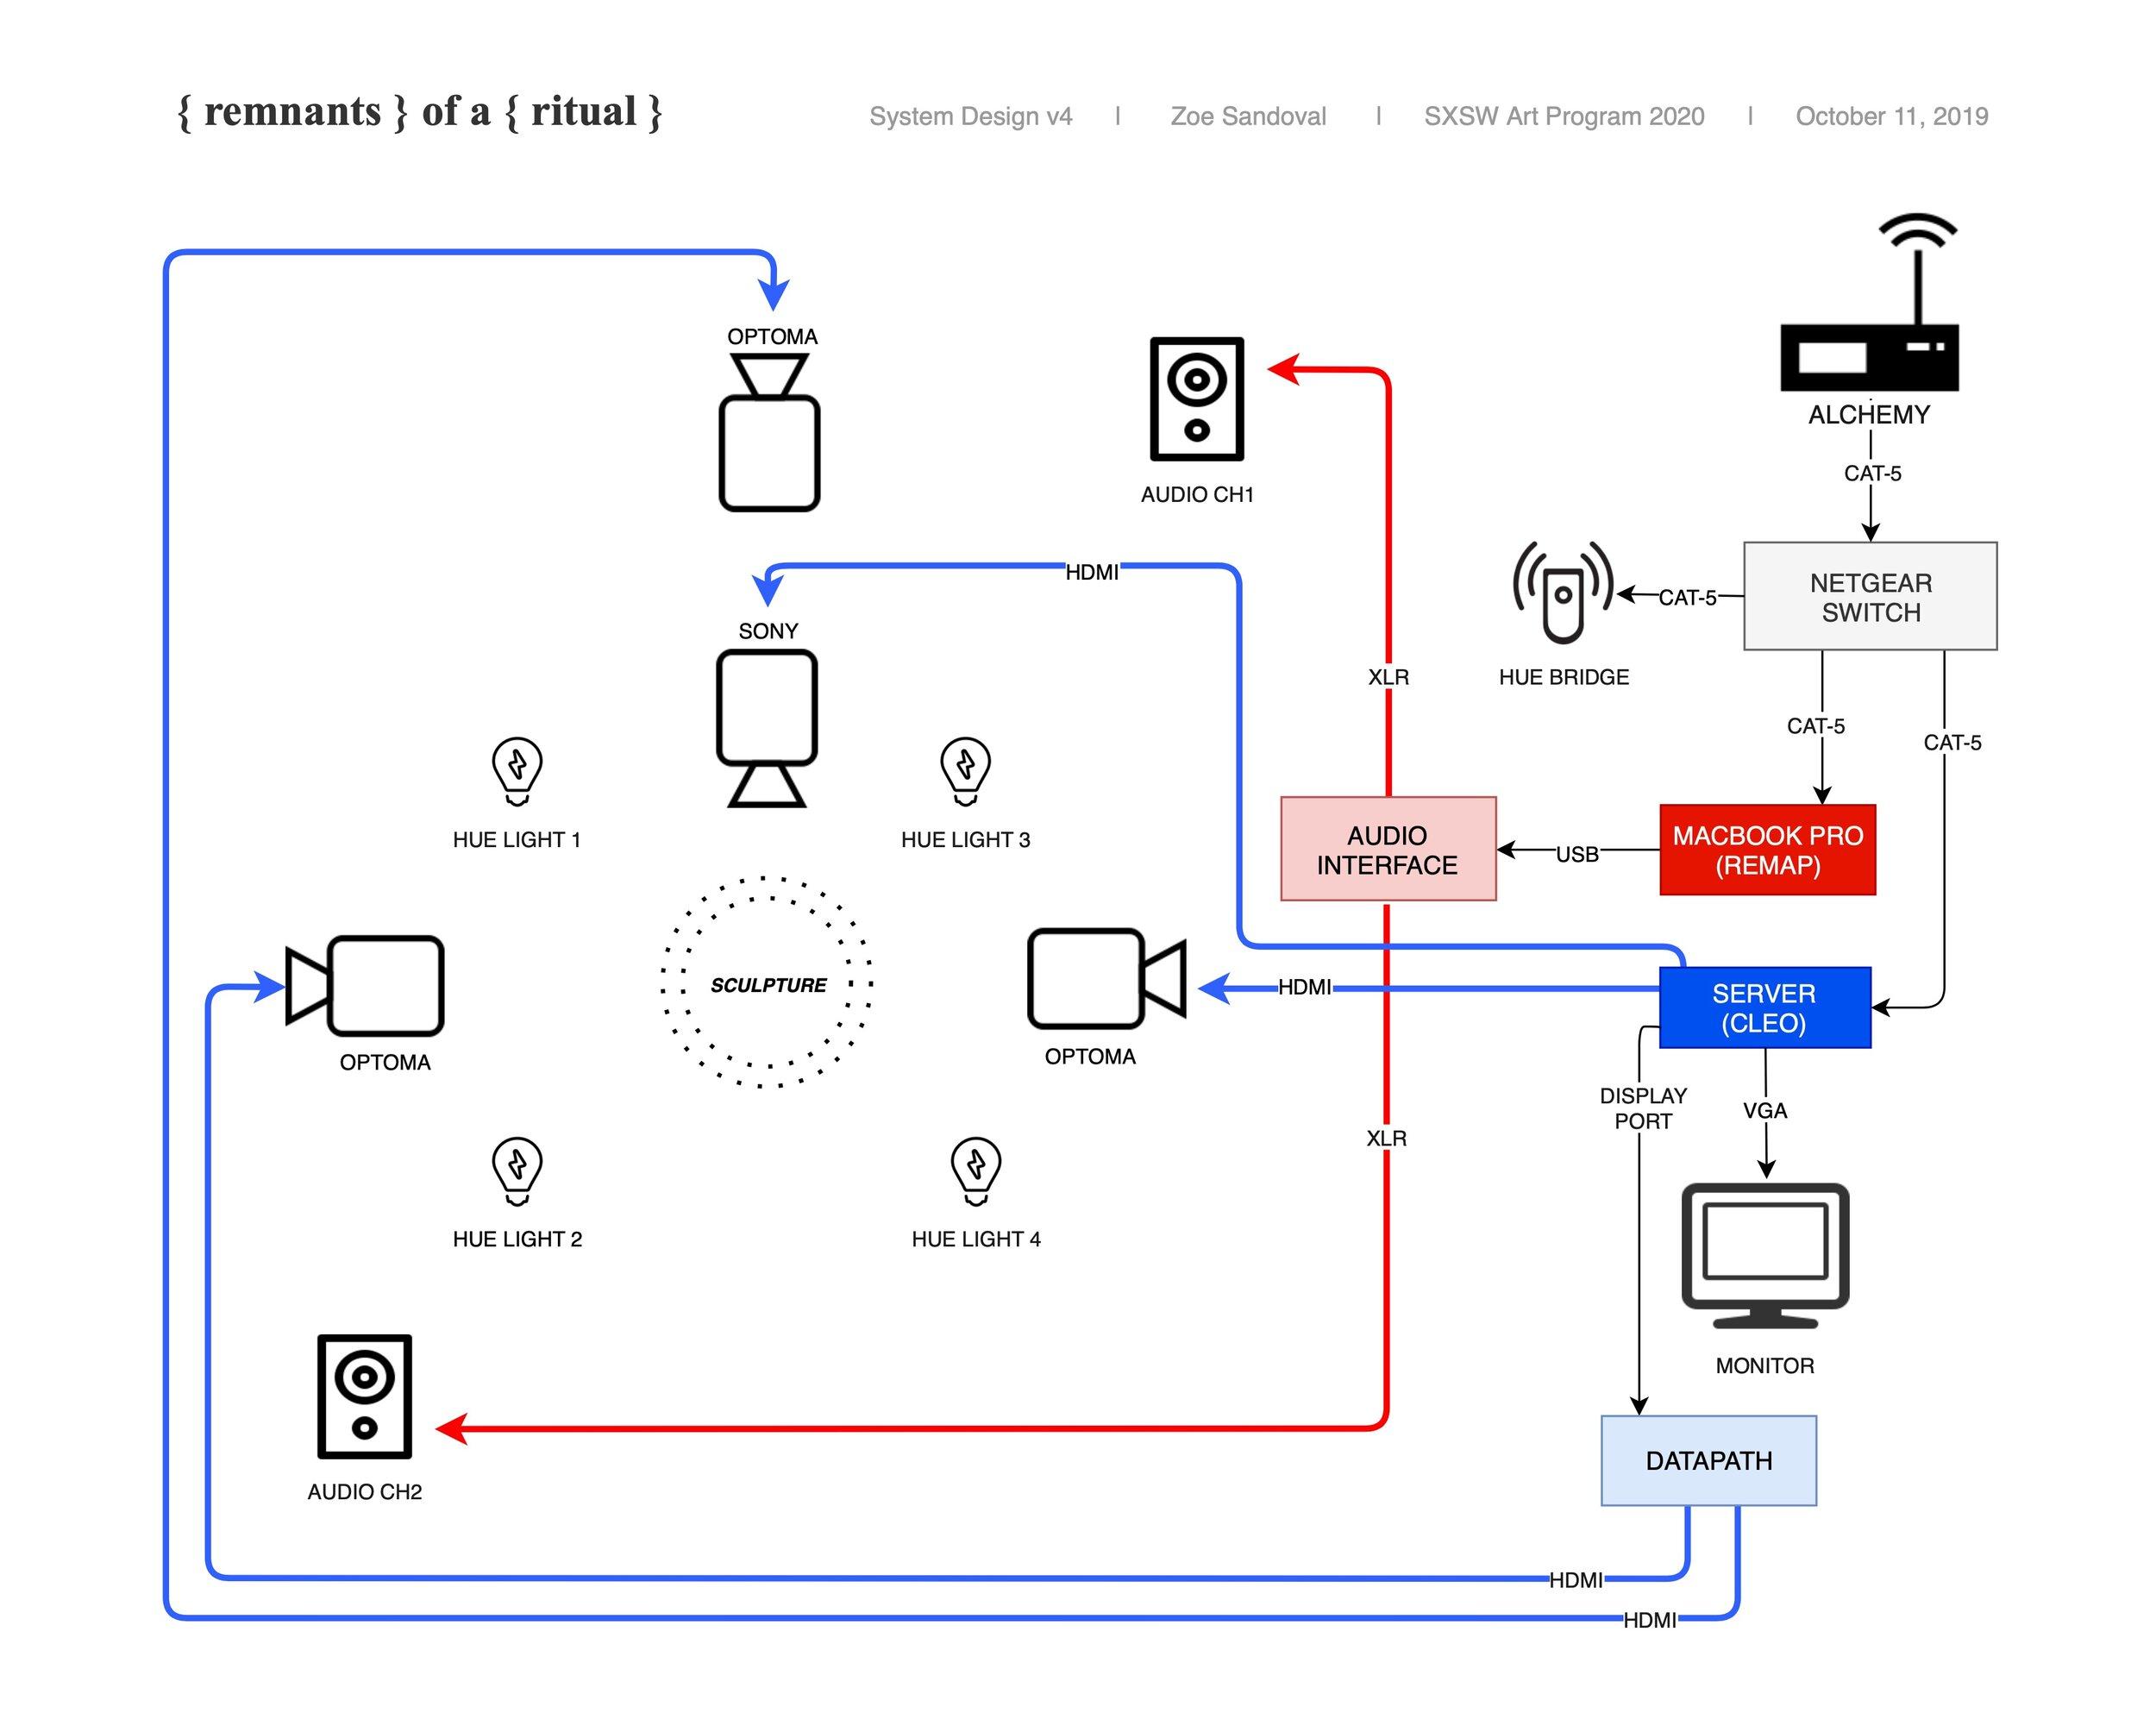 SXSW Art Program 2020 - System Diagram.jpg